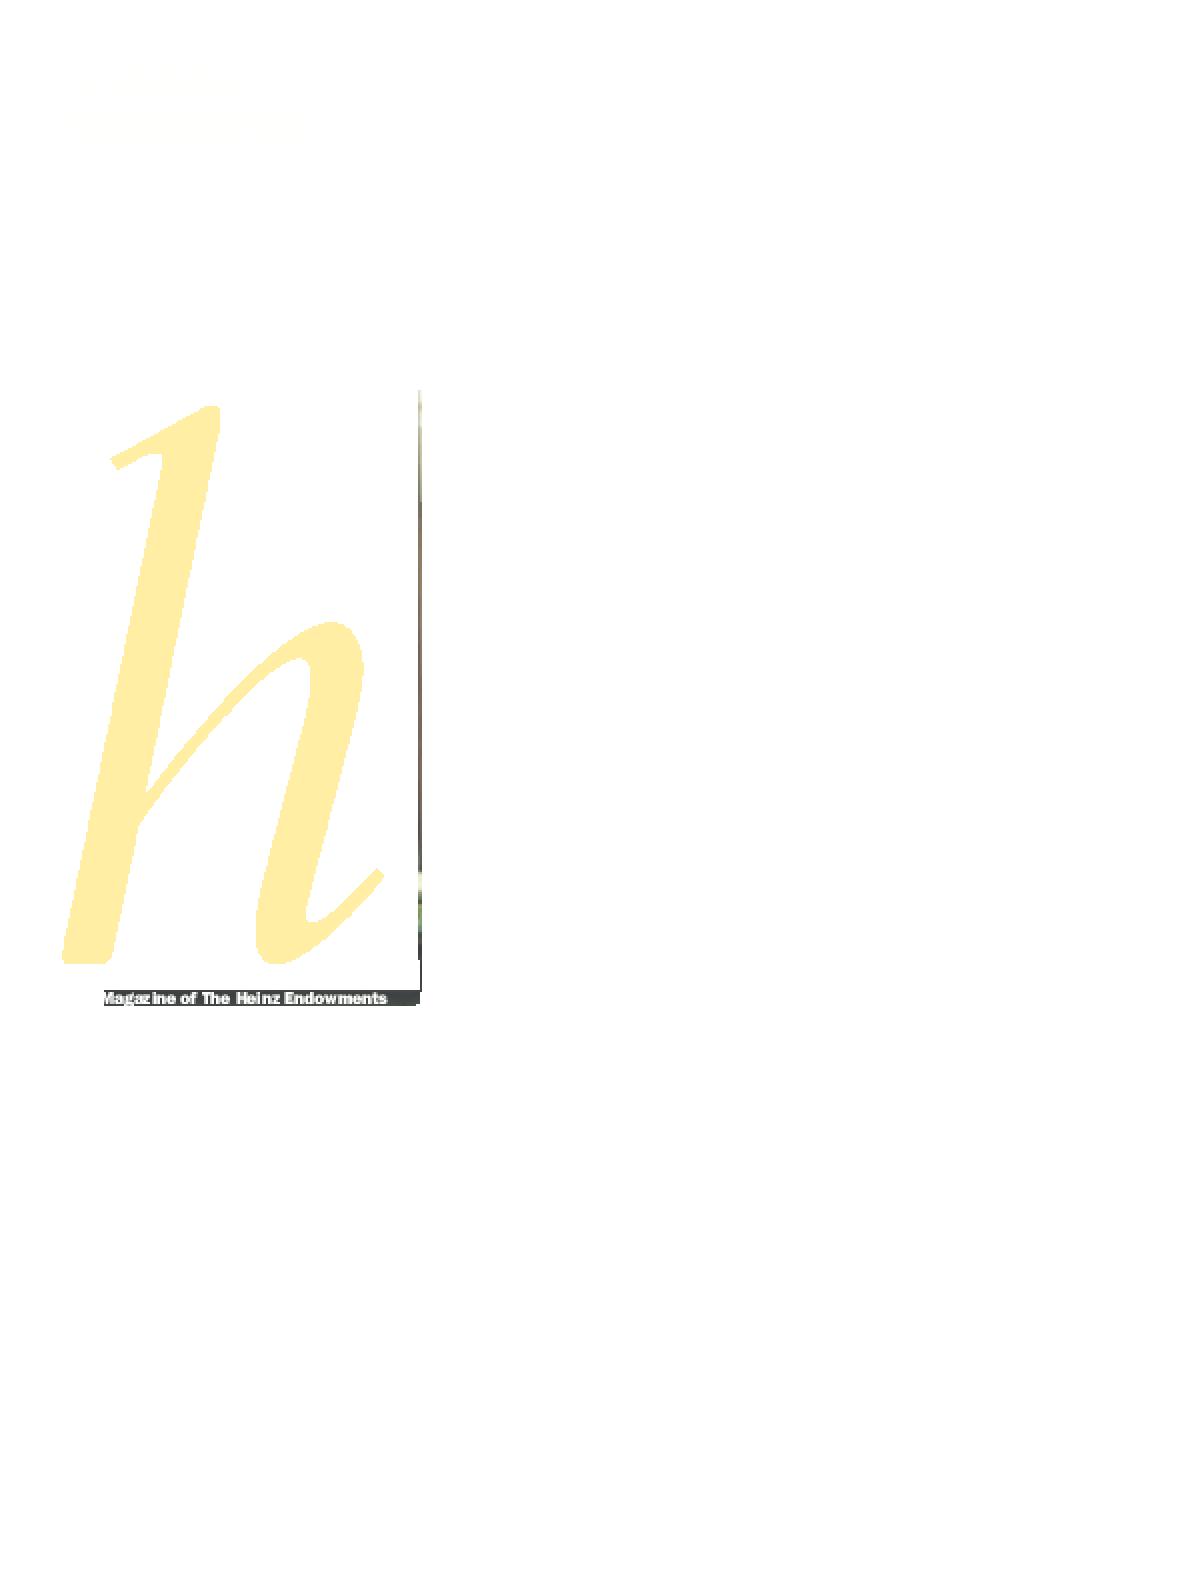 Heinz Endowments 2007 Annual Report